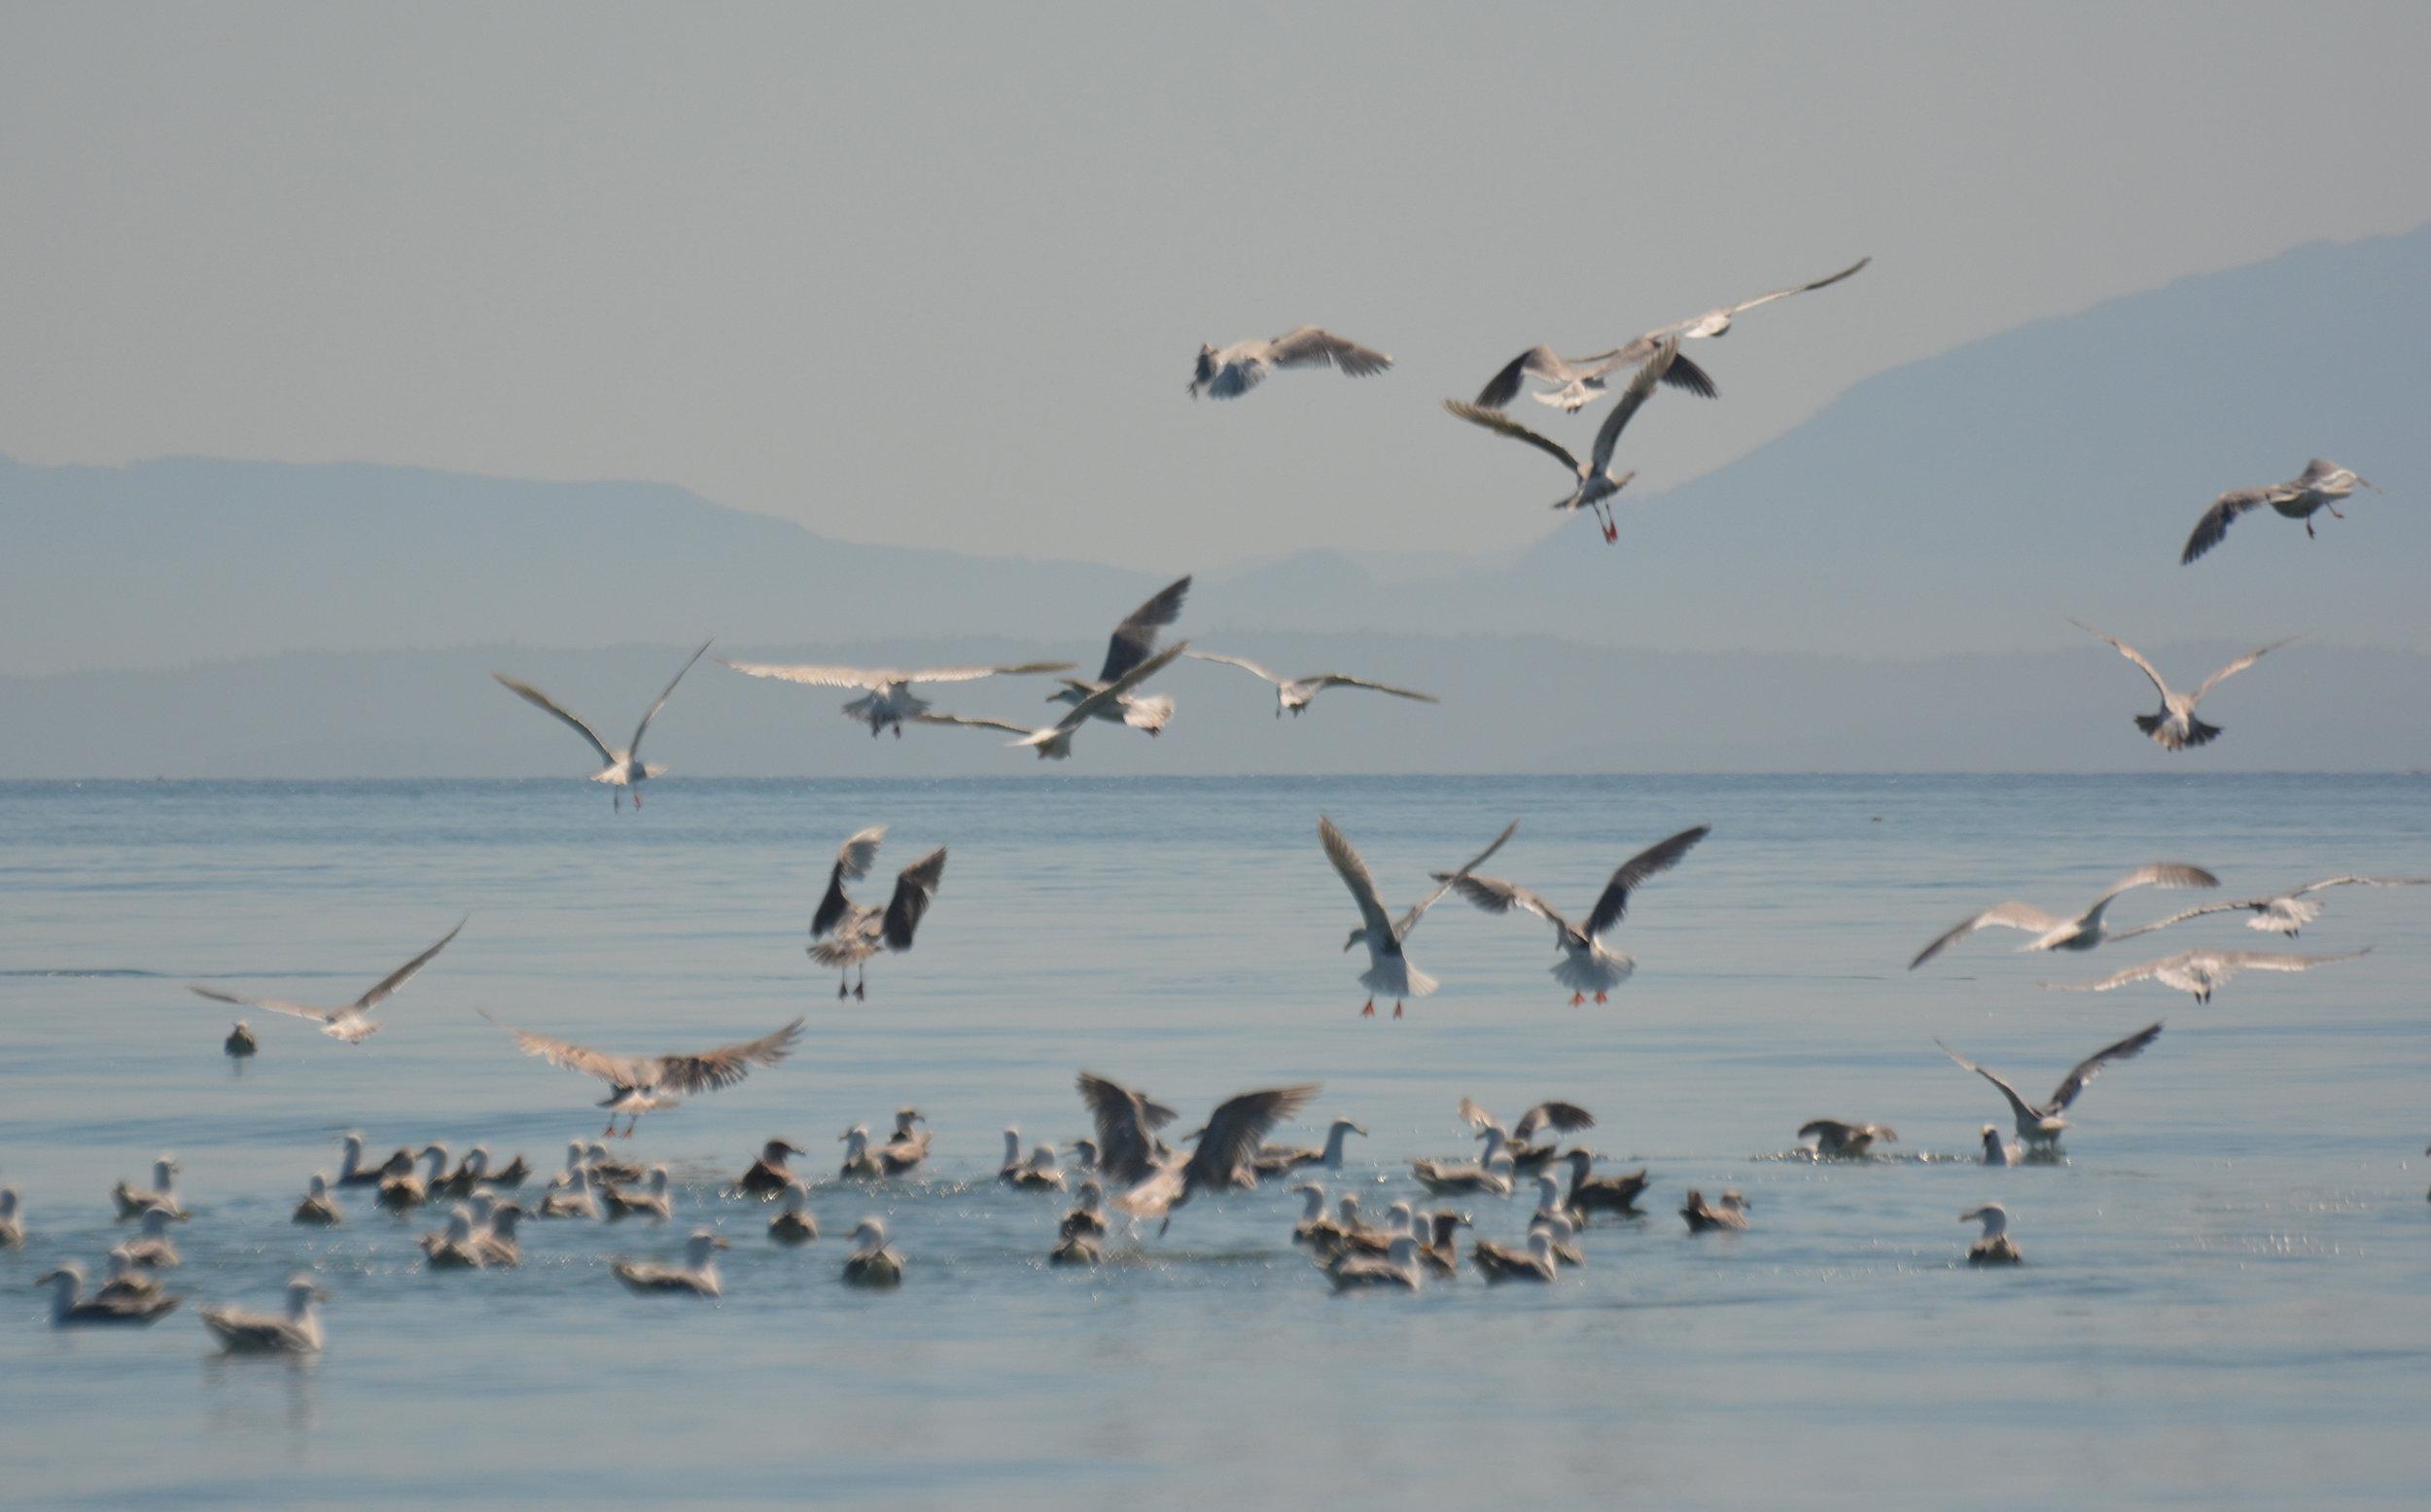 Gulls after a big bait ball in the water! Photo by Rodrigo Menezes.